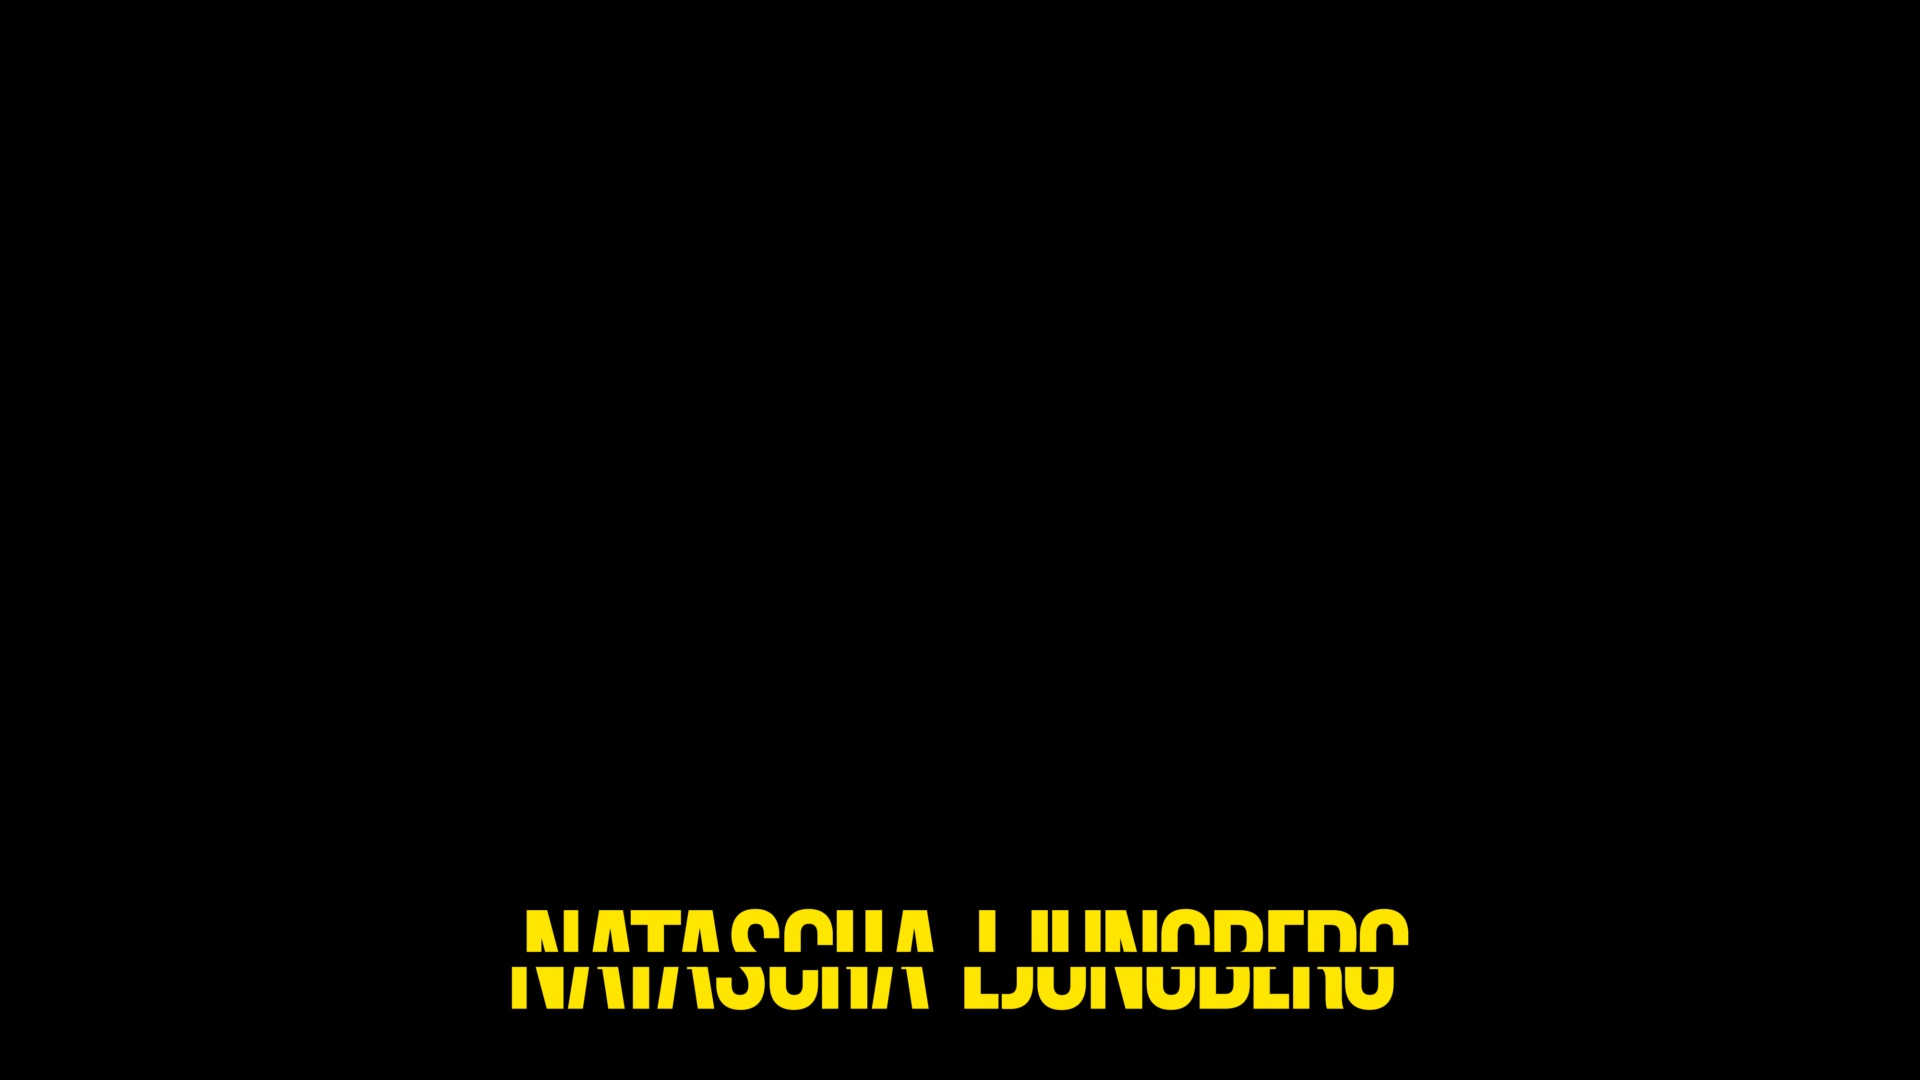 Natascha Ljungberg